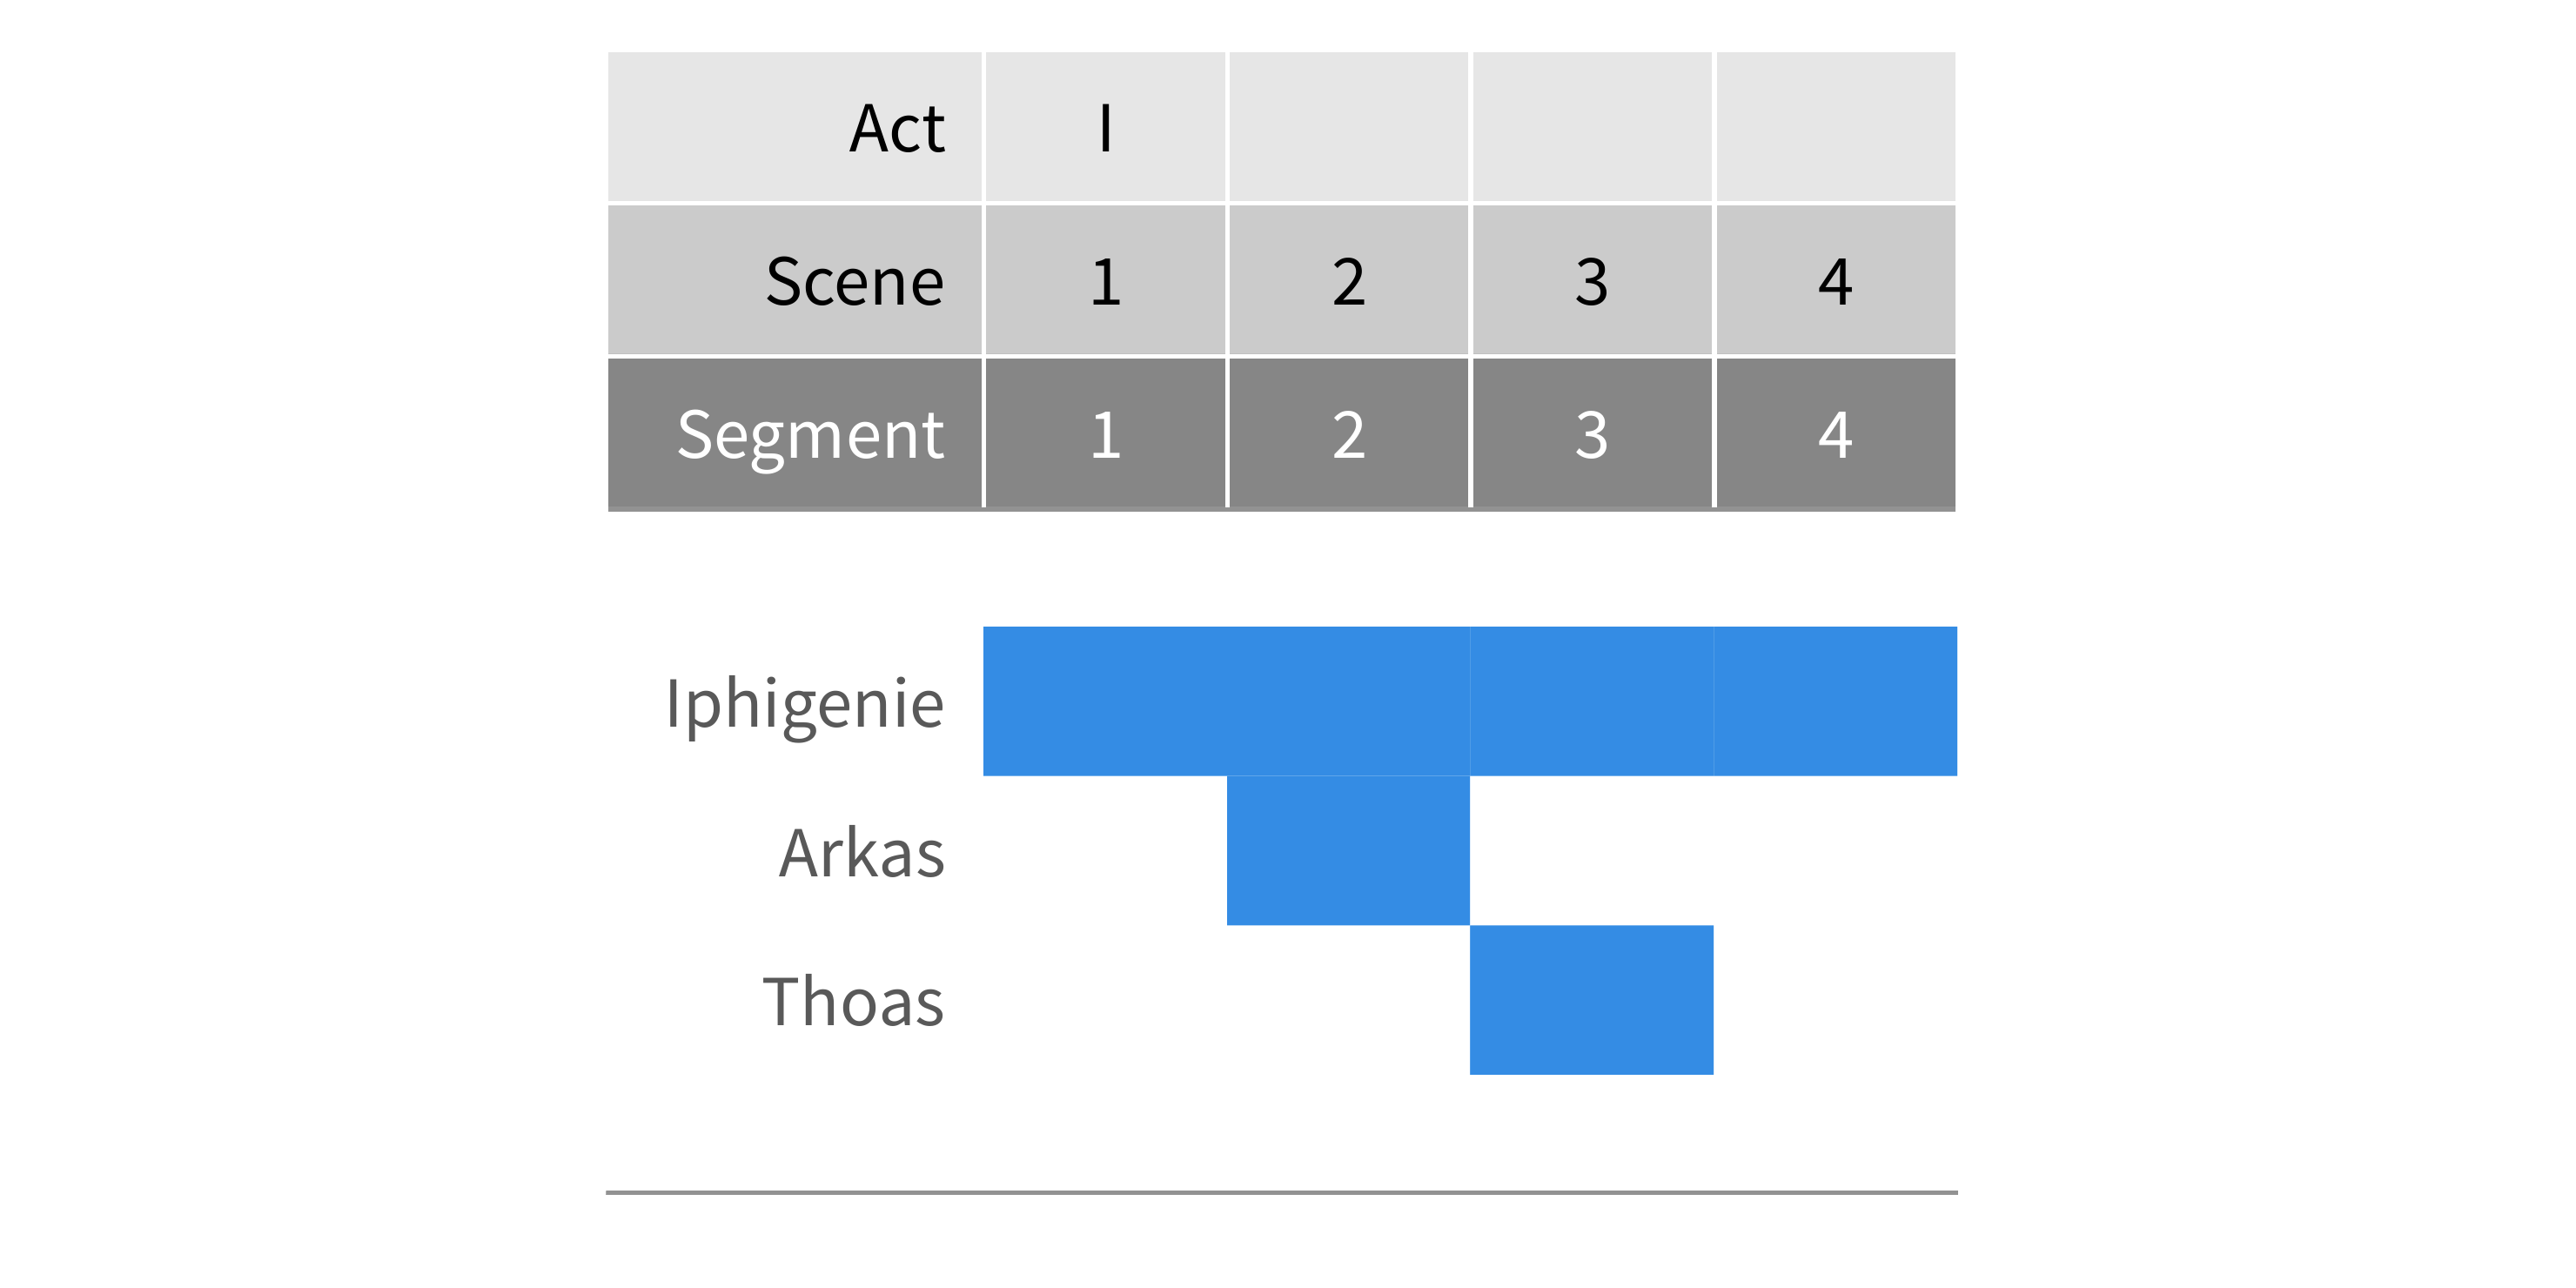 Abb. 12: Segmentmatrix des 1. Aktes                                     von Goethes Iphigenie (1787). © Eigene                                     Grafik, 2017: CC BY 4.0.